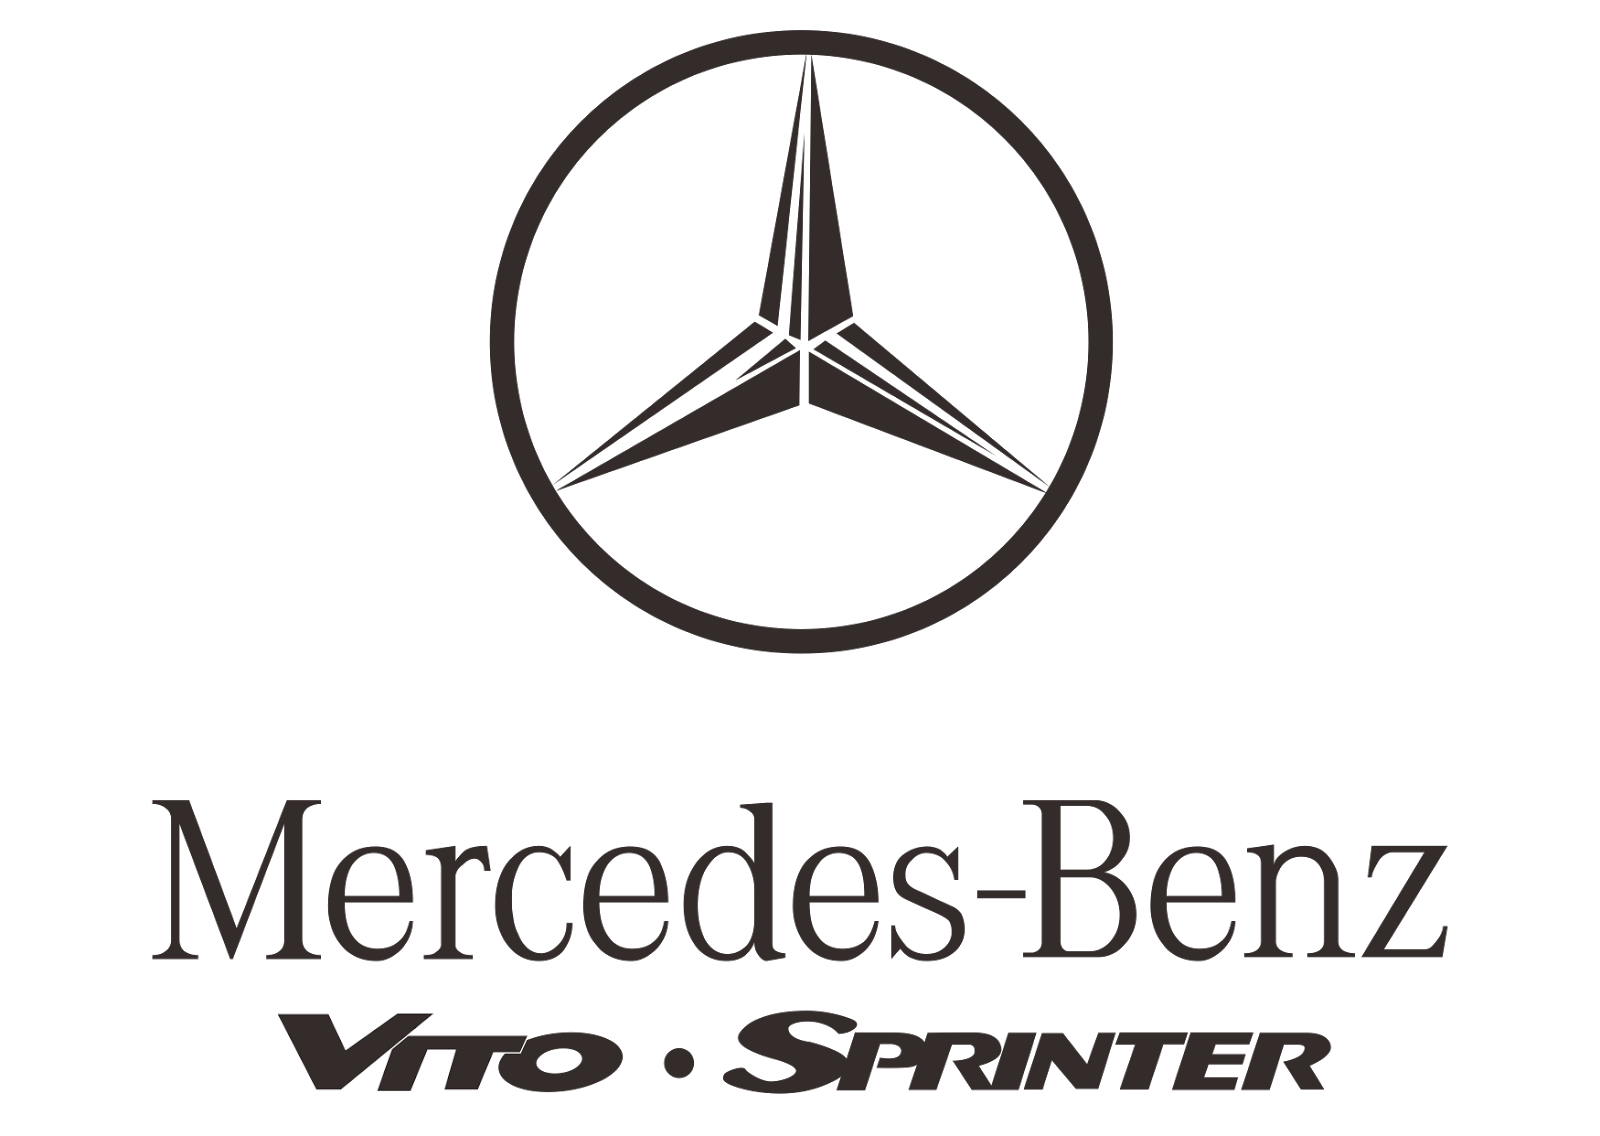 Mercedes vito vector free